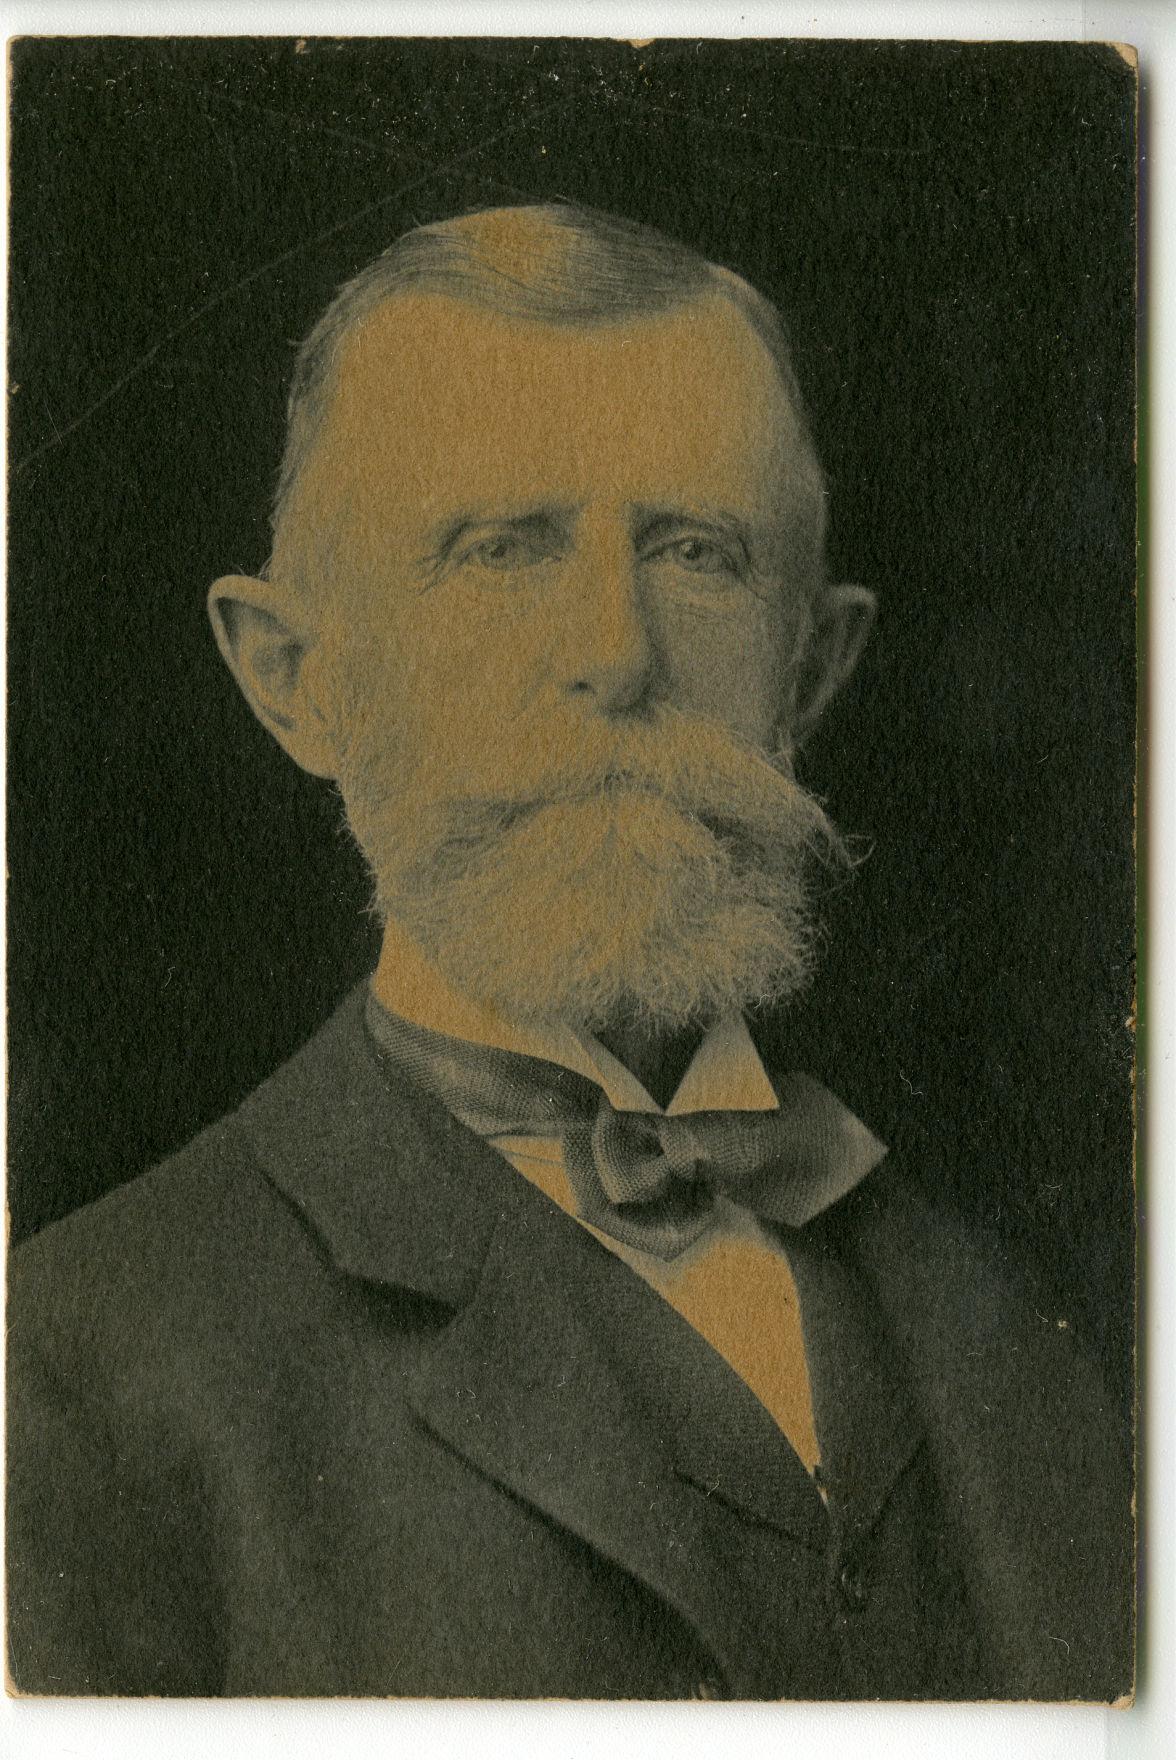 Alfred H. Belo